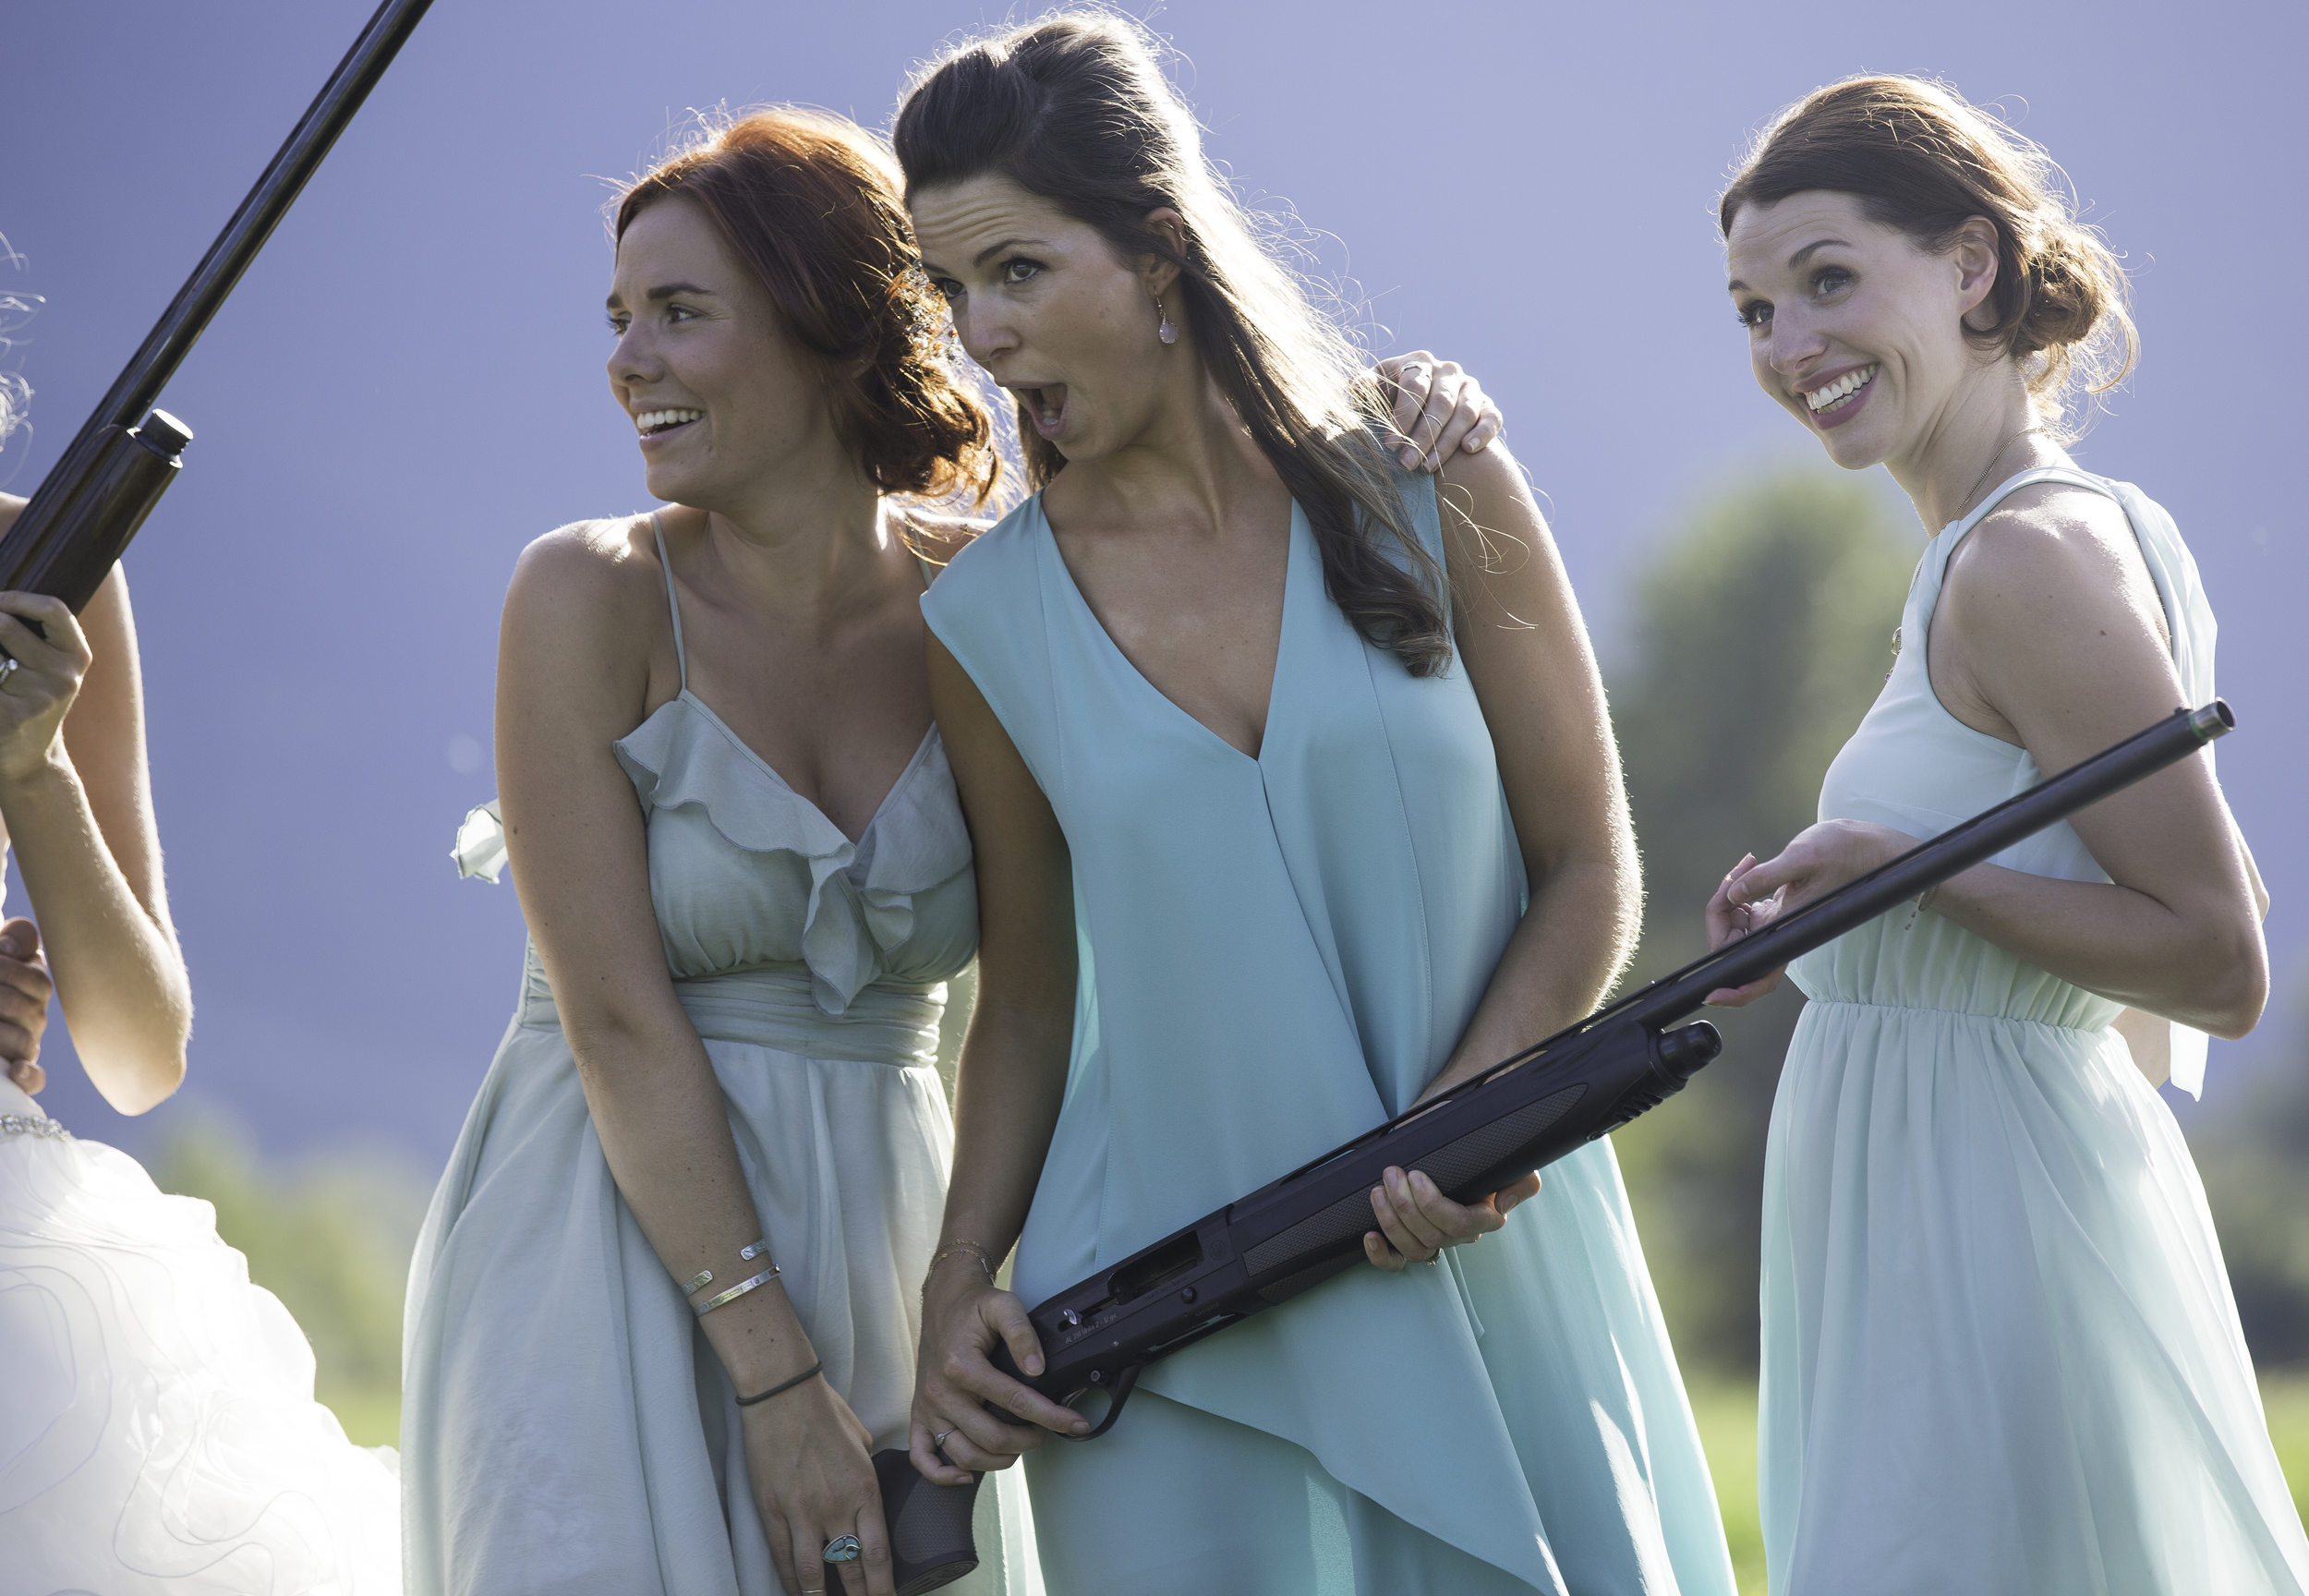 Laughs, shotguns and shotskis. The bridesmaids were a blast.